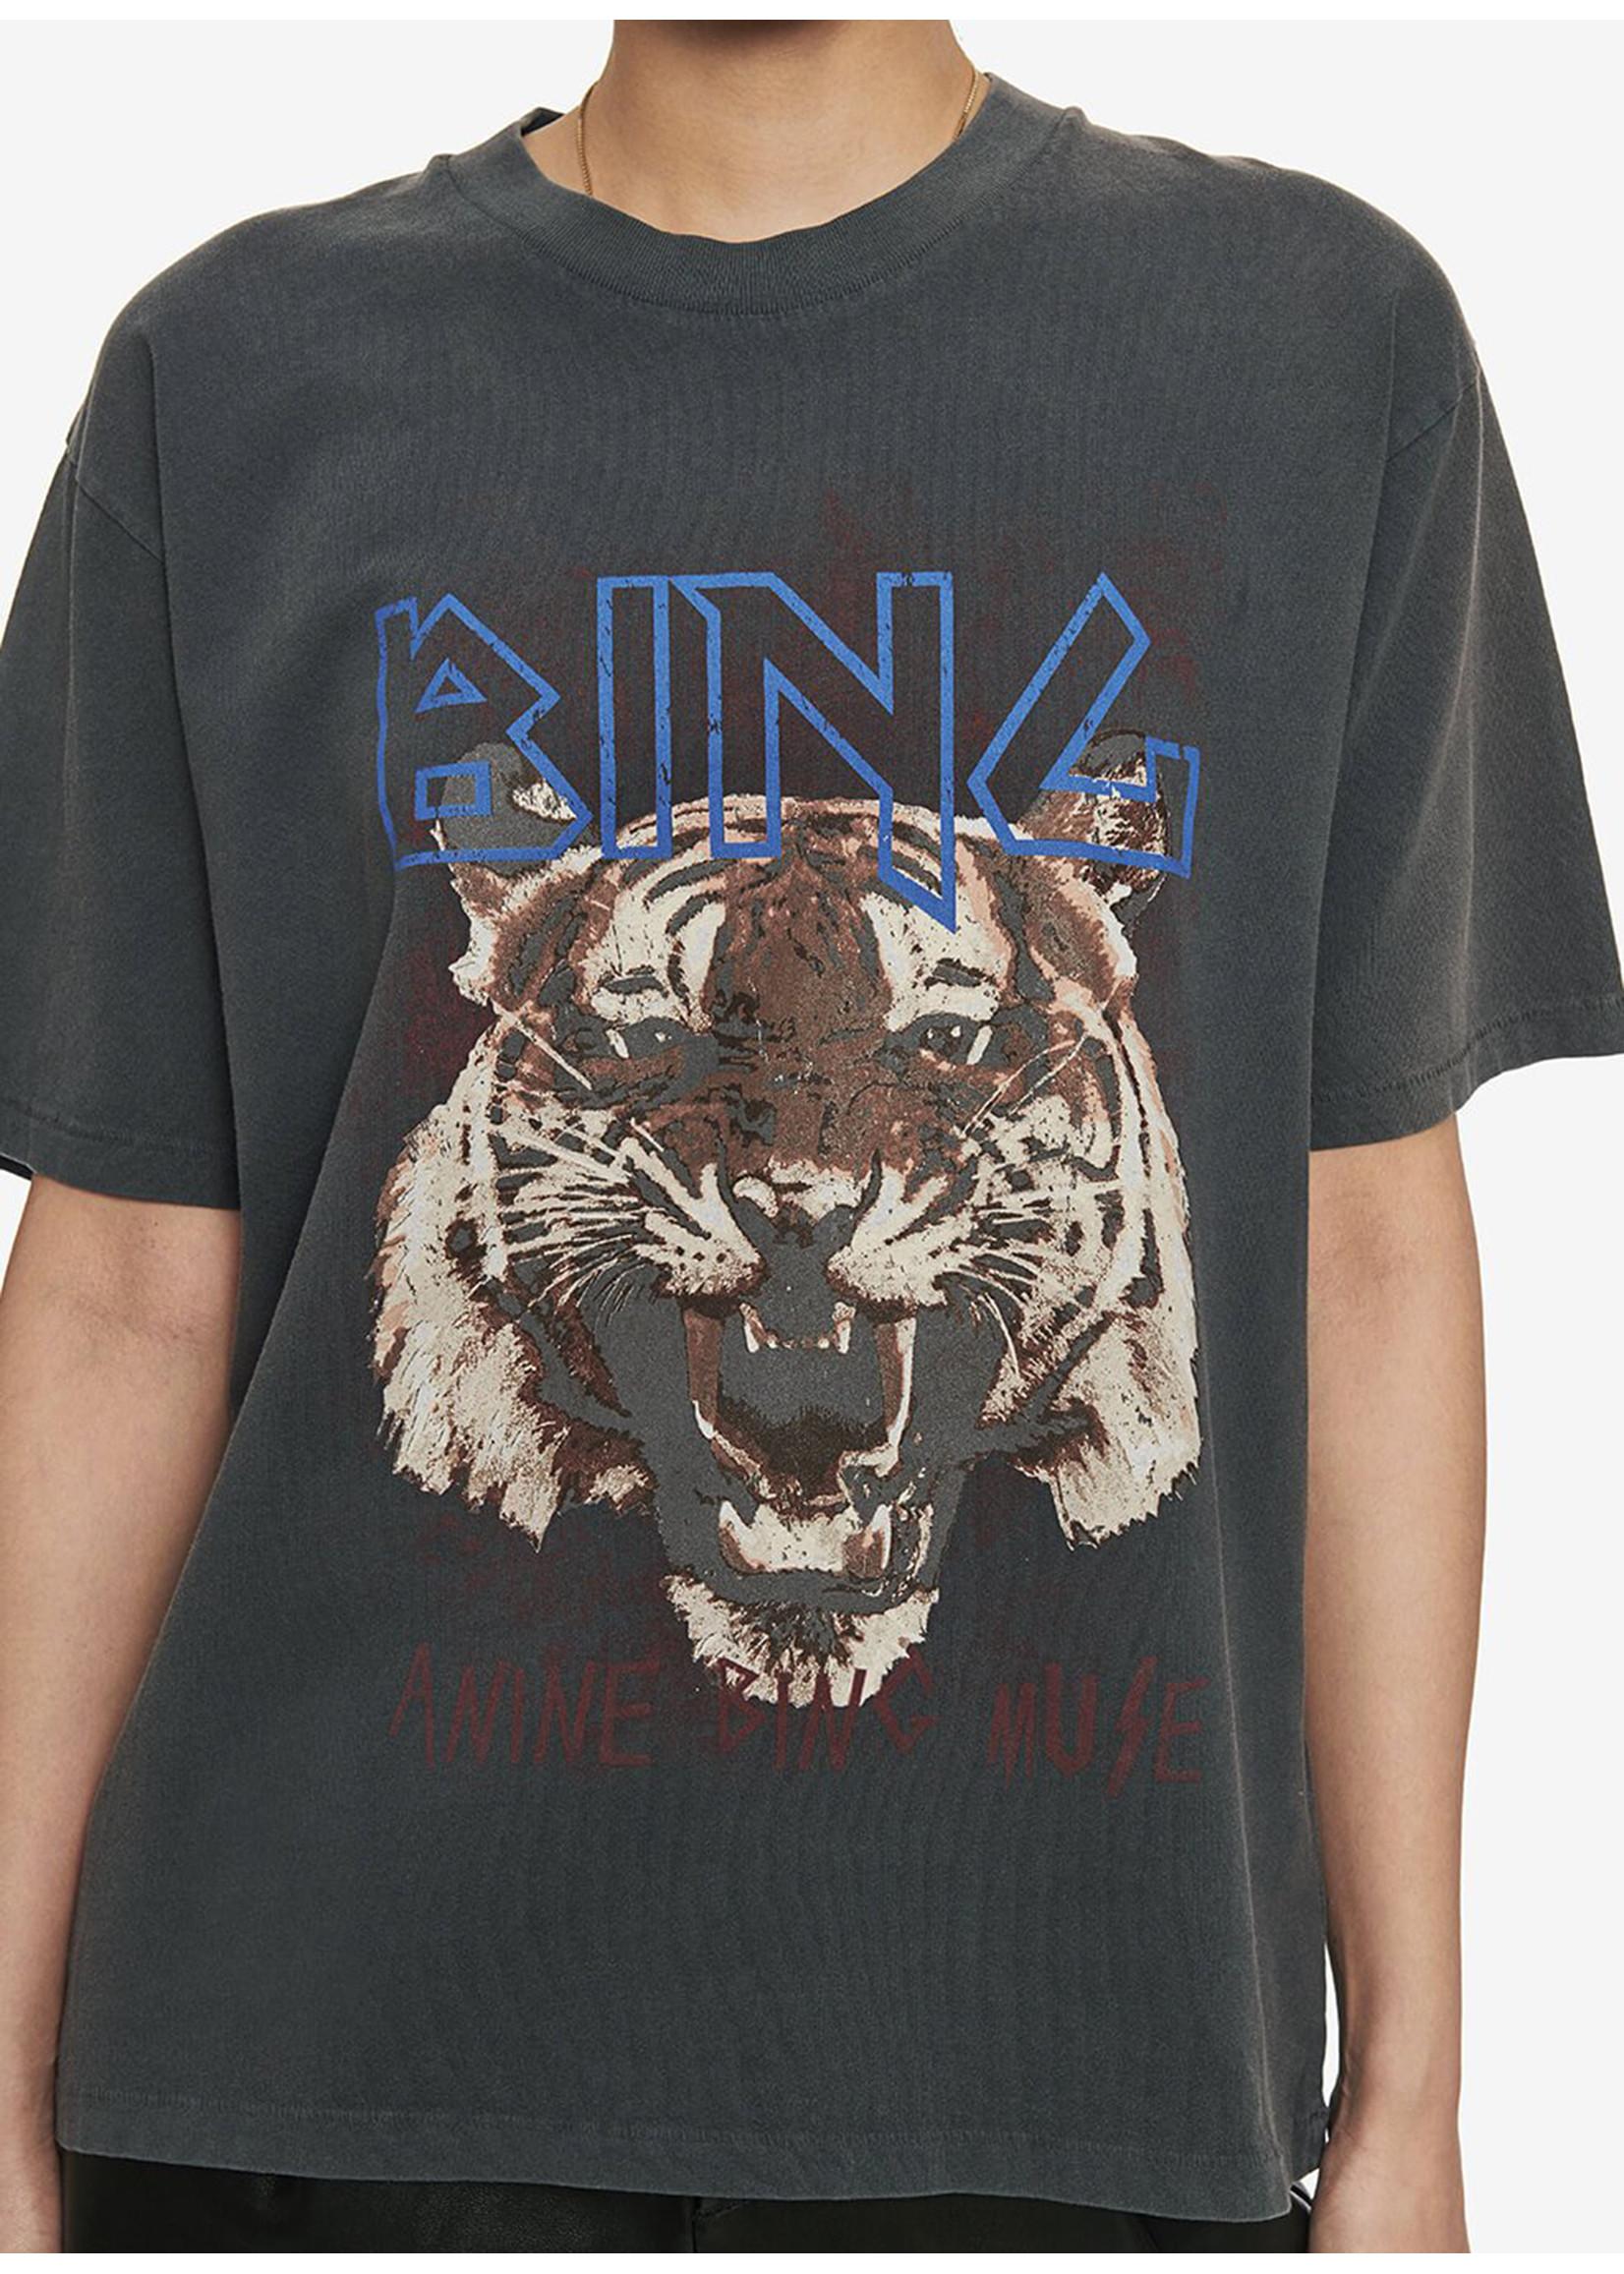 Anine Bing Tiger tee black